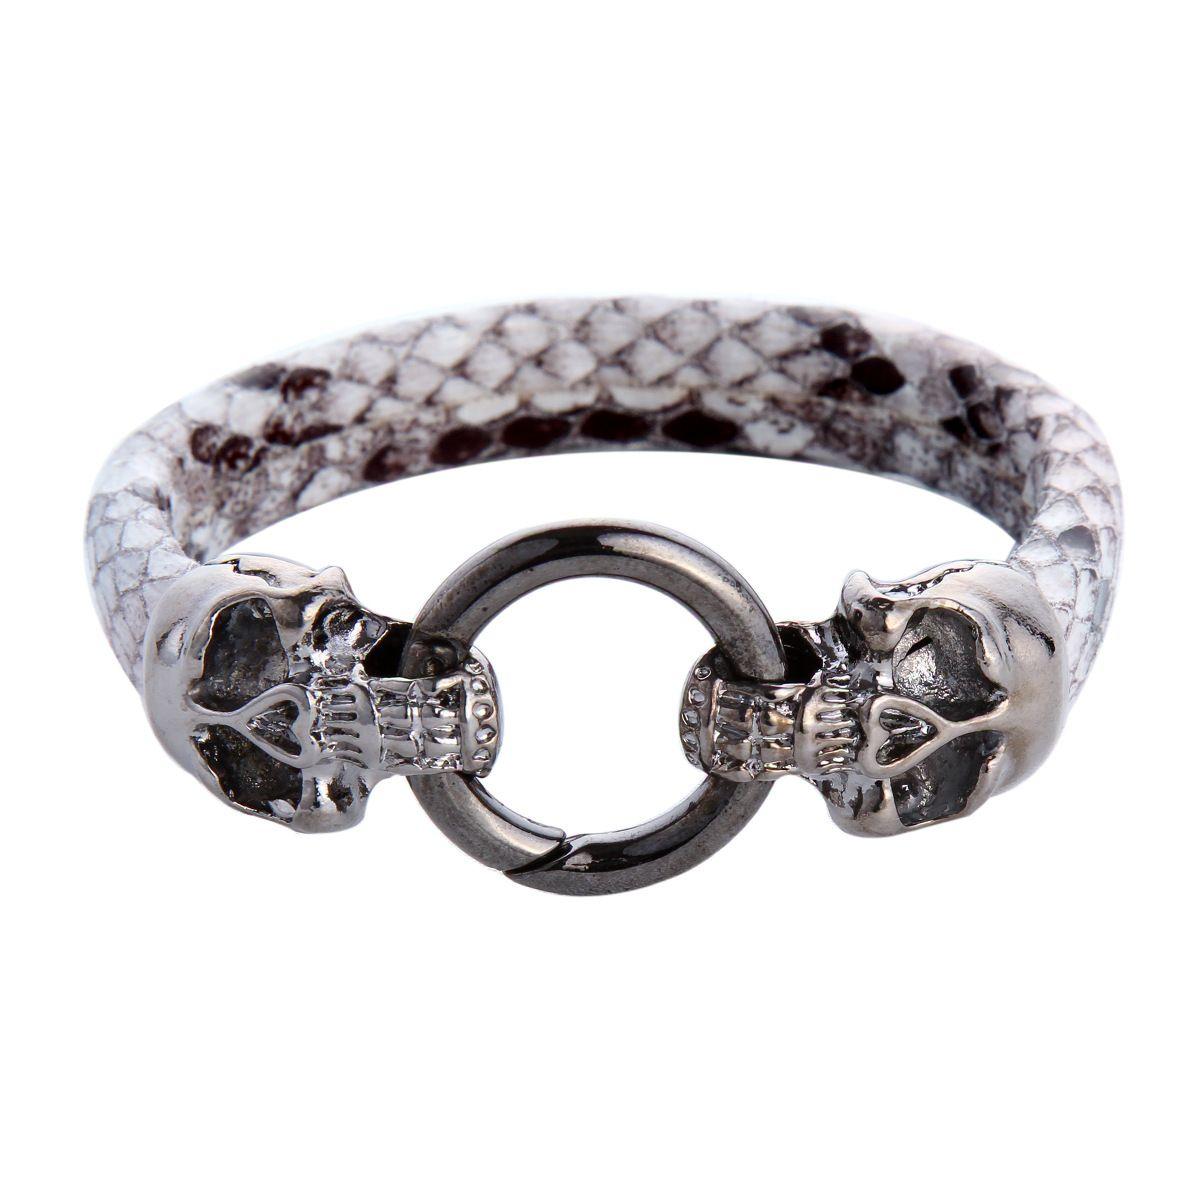 New Men Leather Bracelet Fashion Skull Snakeskin Bracelets Hiphop ...